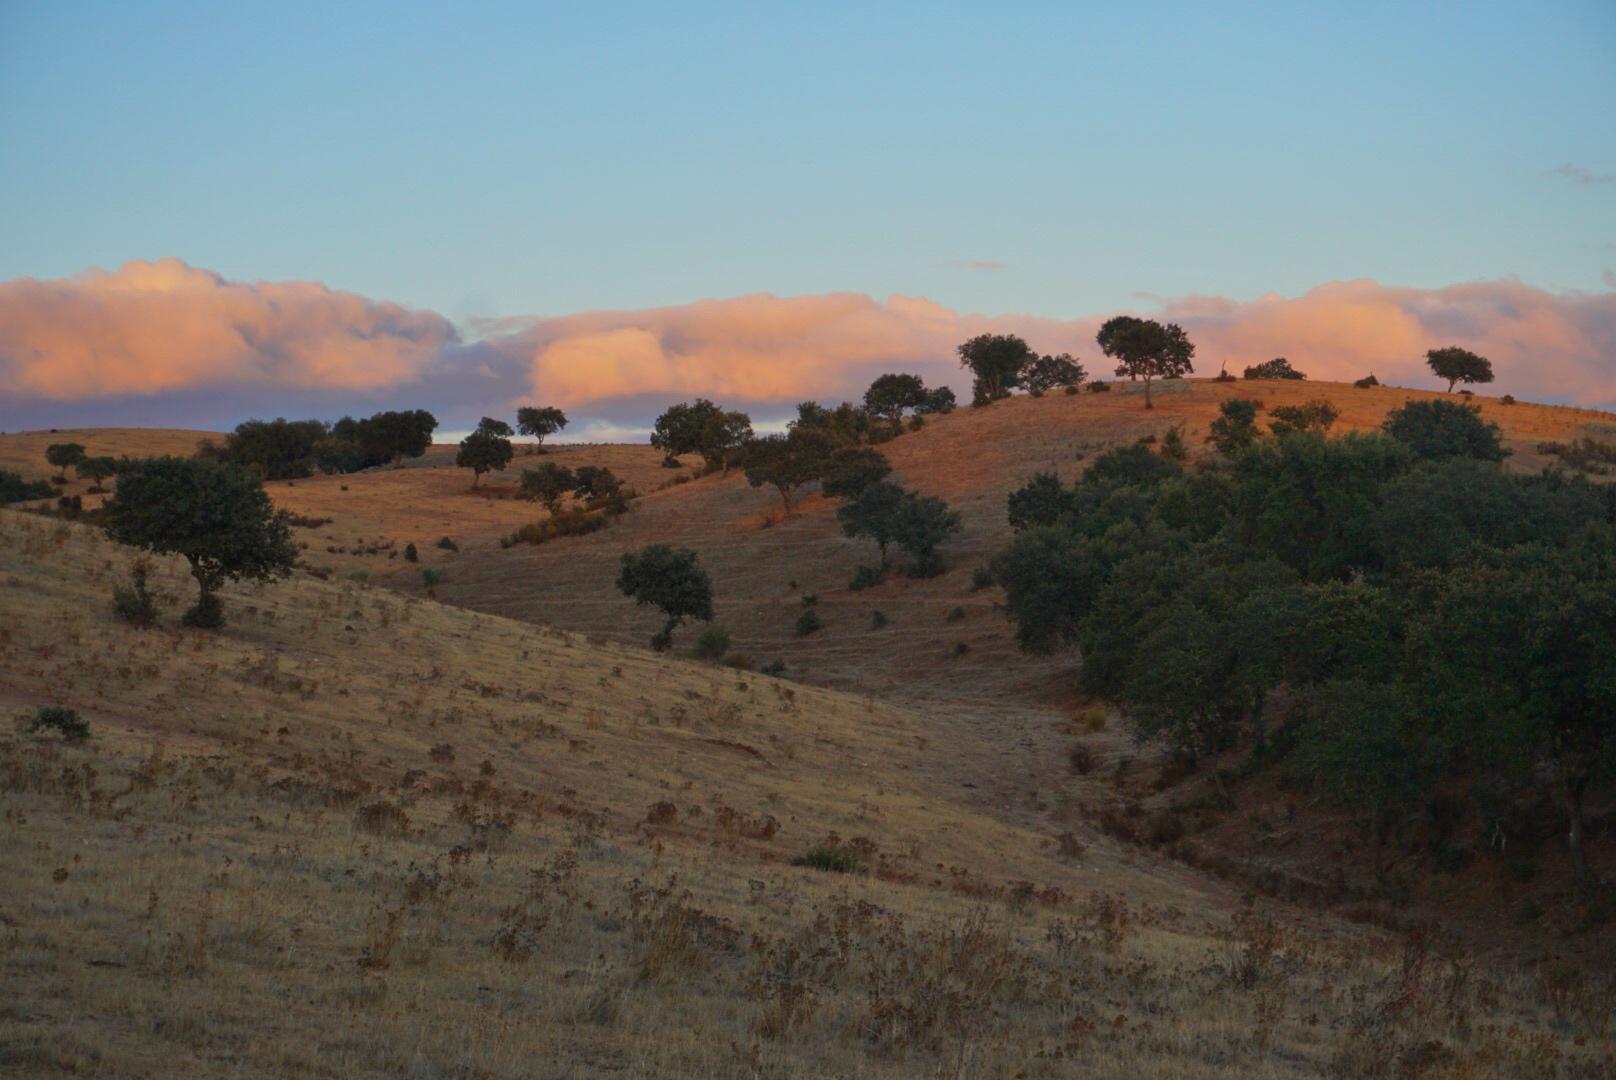 Sunrise at Alentejo, Portugal